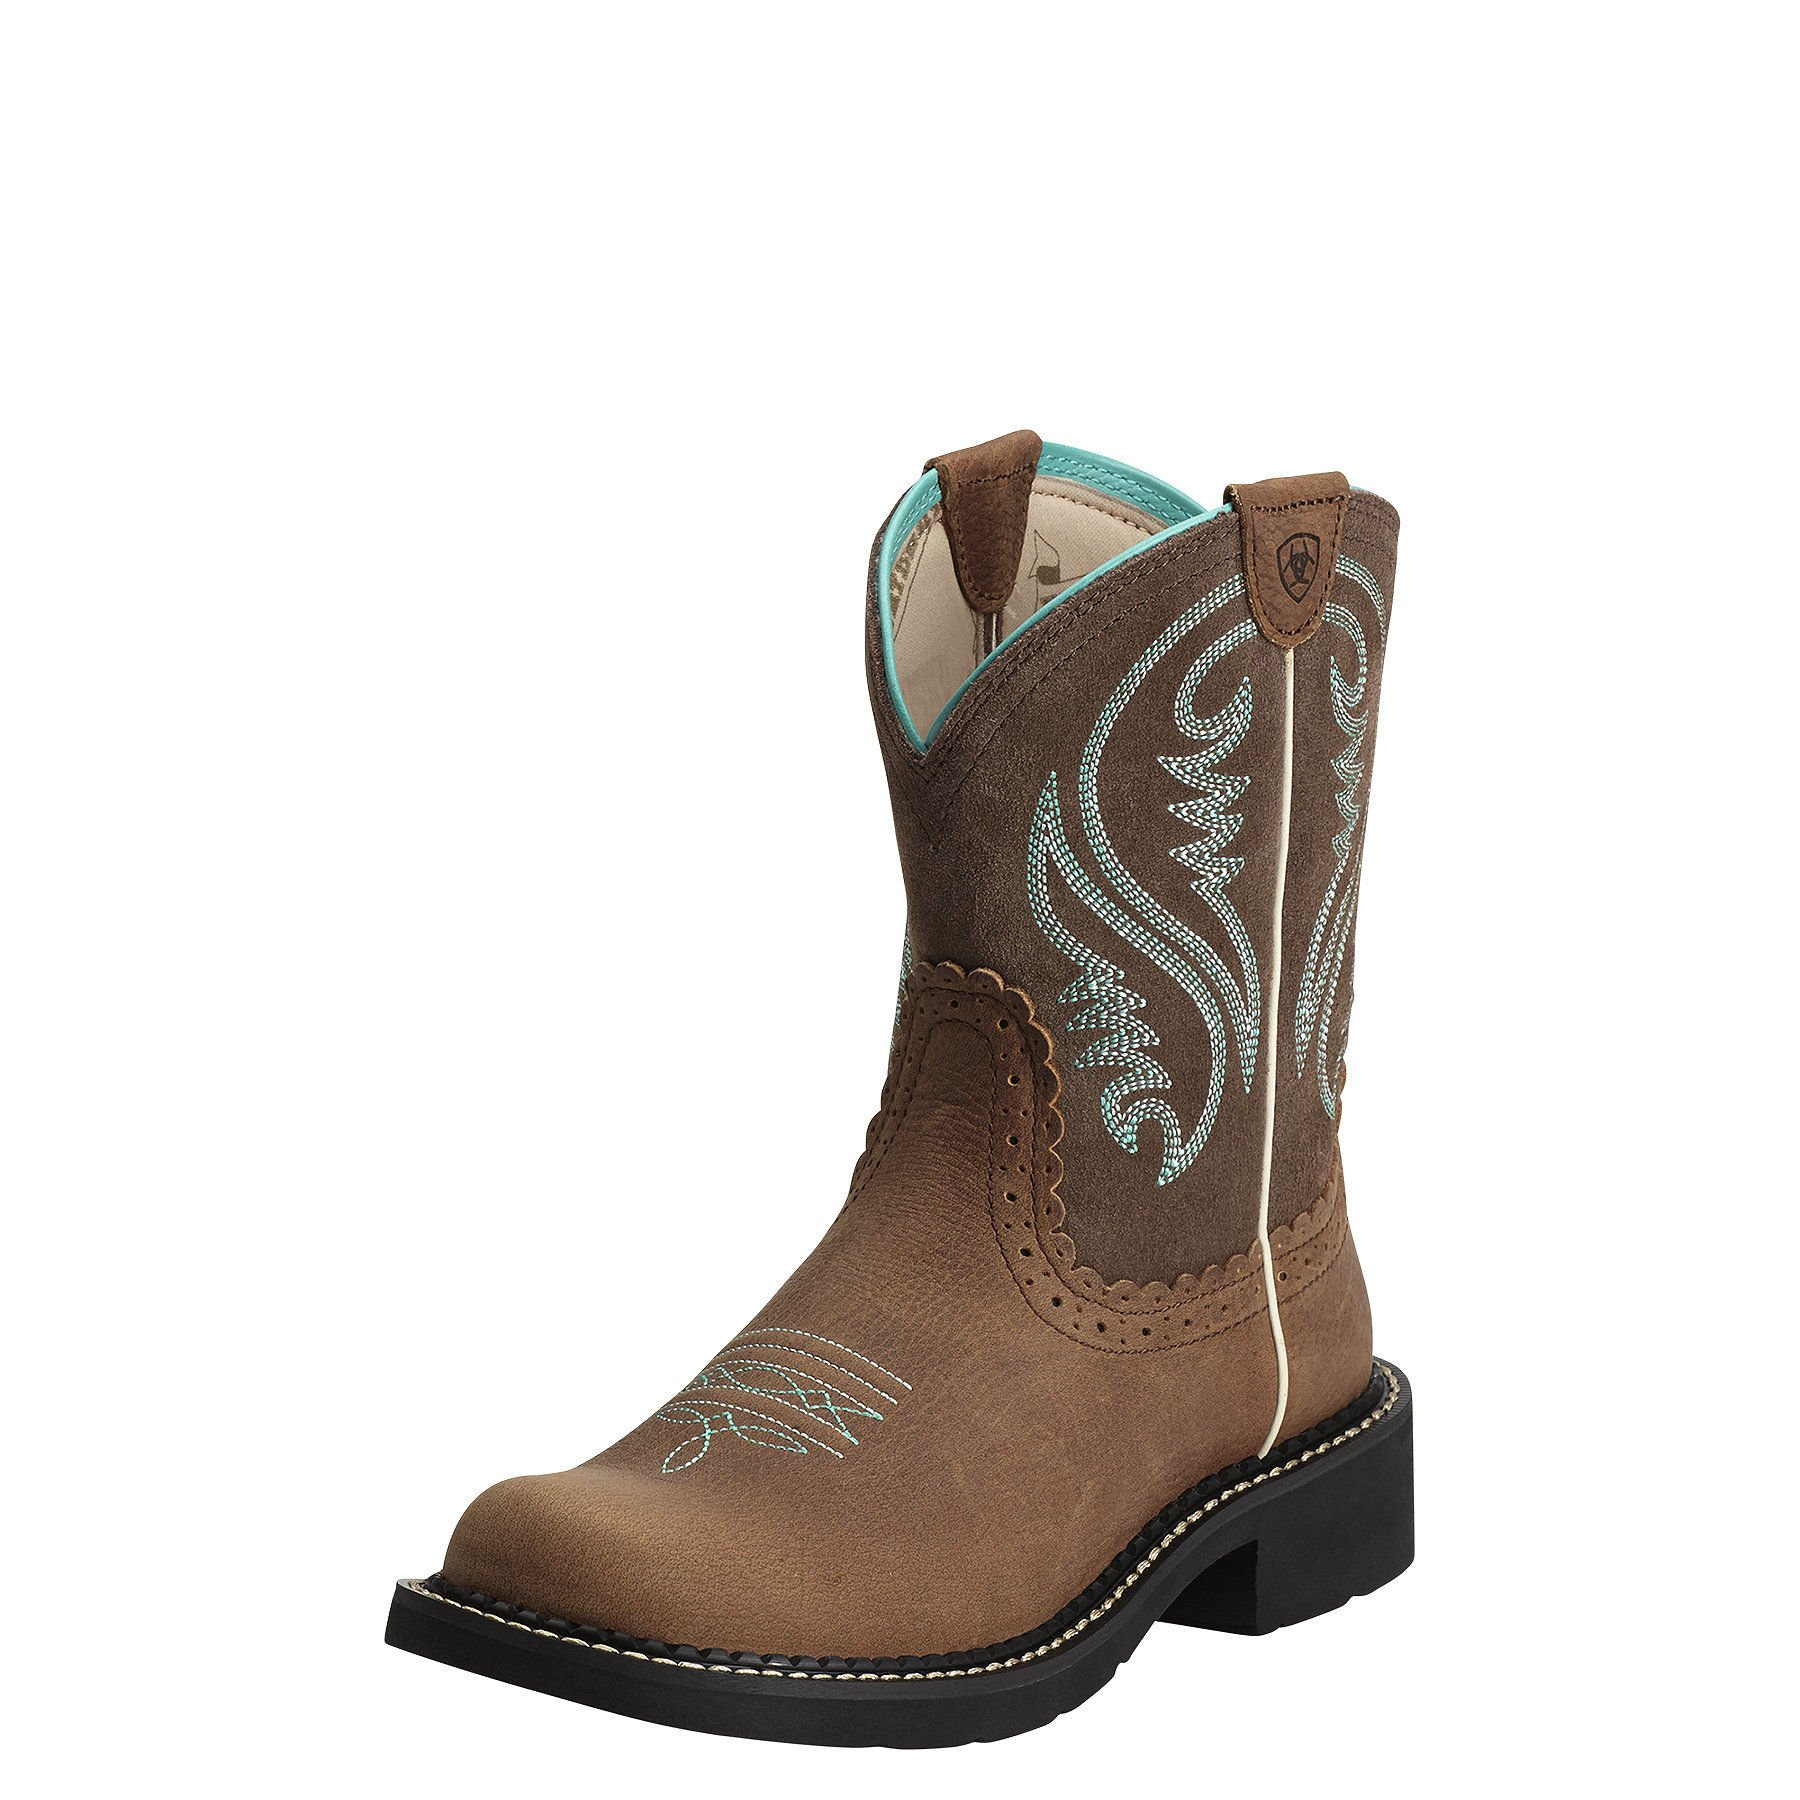 ARIAT WOMEN Fatbaby Heritage Western Cowboy Boot, Tan Rowdy/Tan, 6 M US